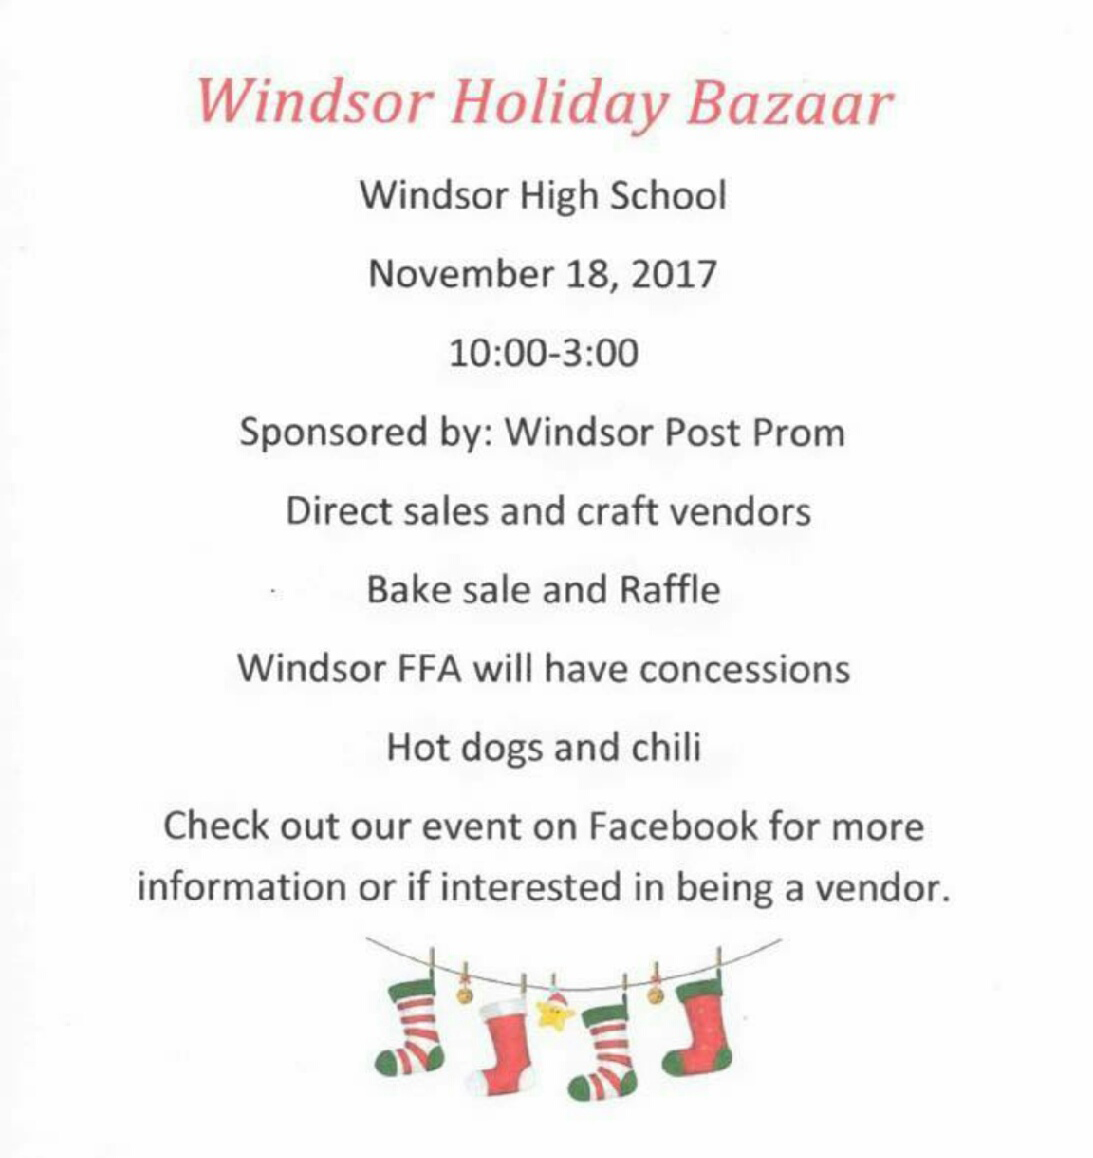 Windsor Holiday Buzaar Saturday